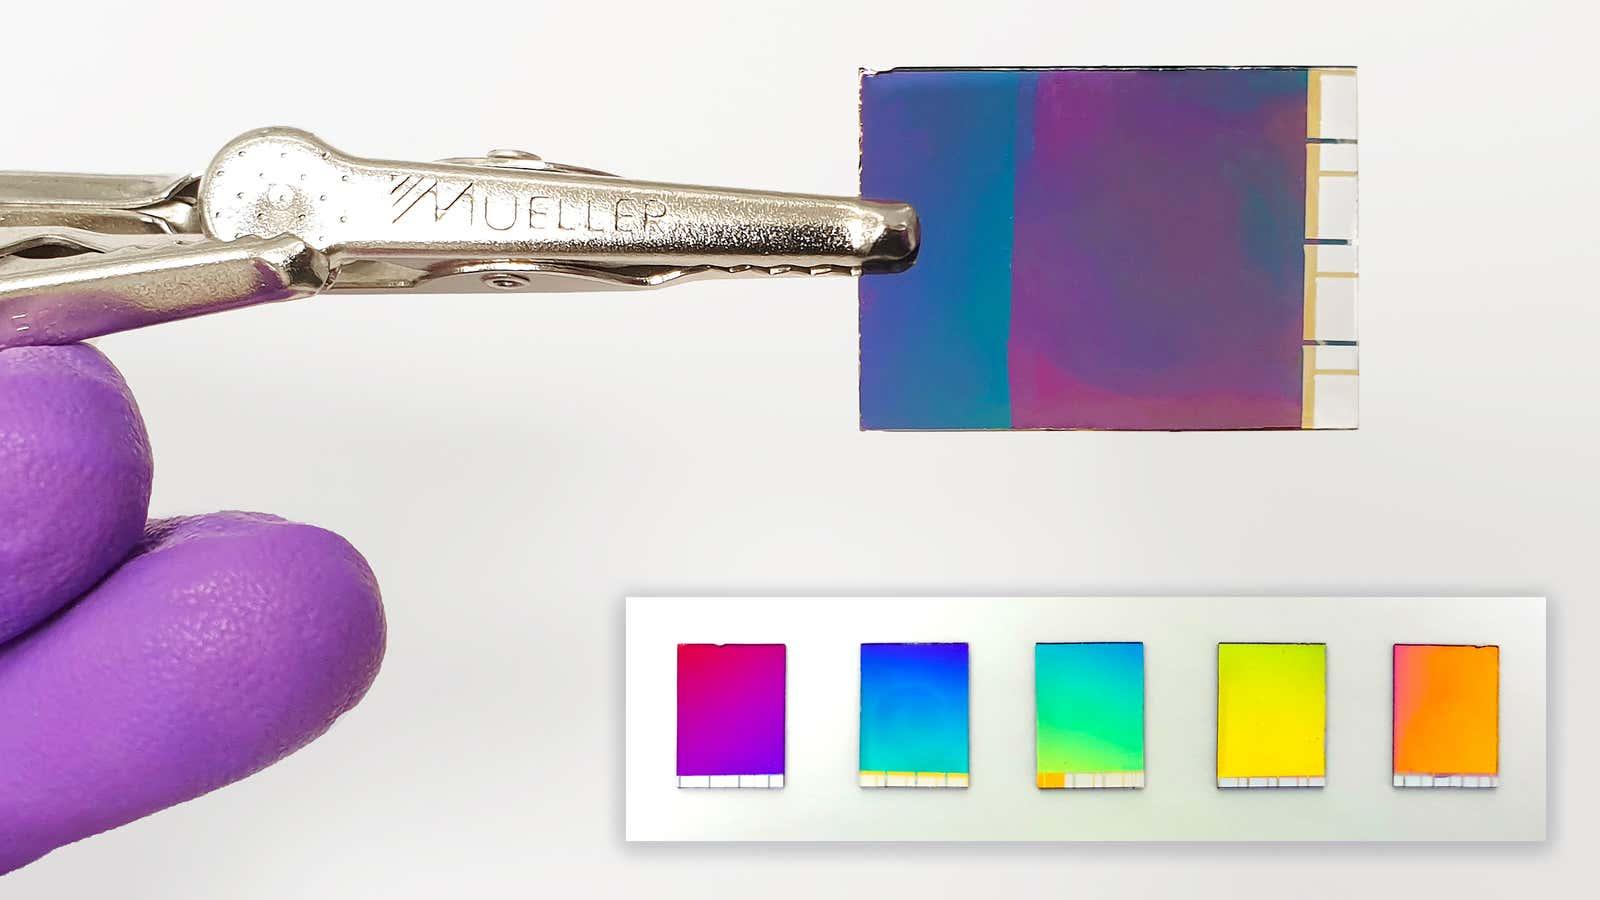 Panel de tinta electrónica a color con forma de papel